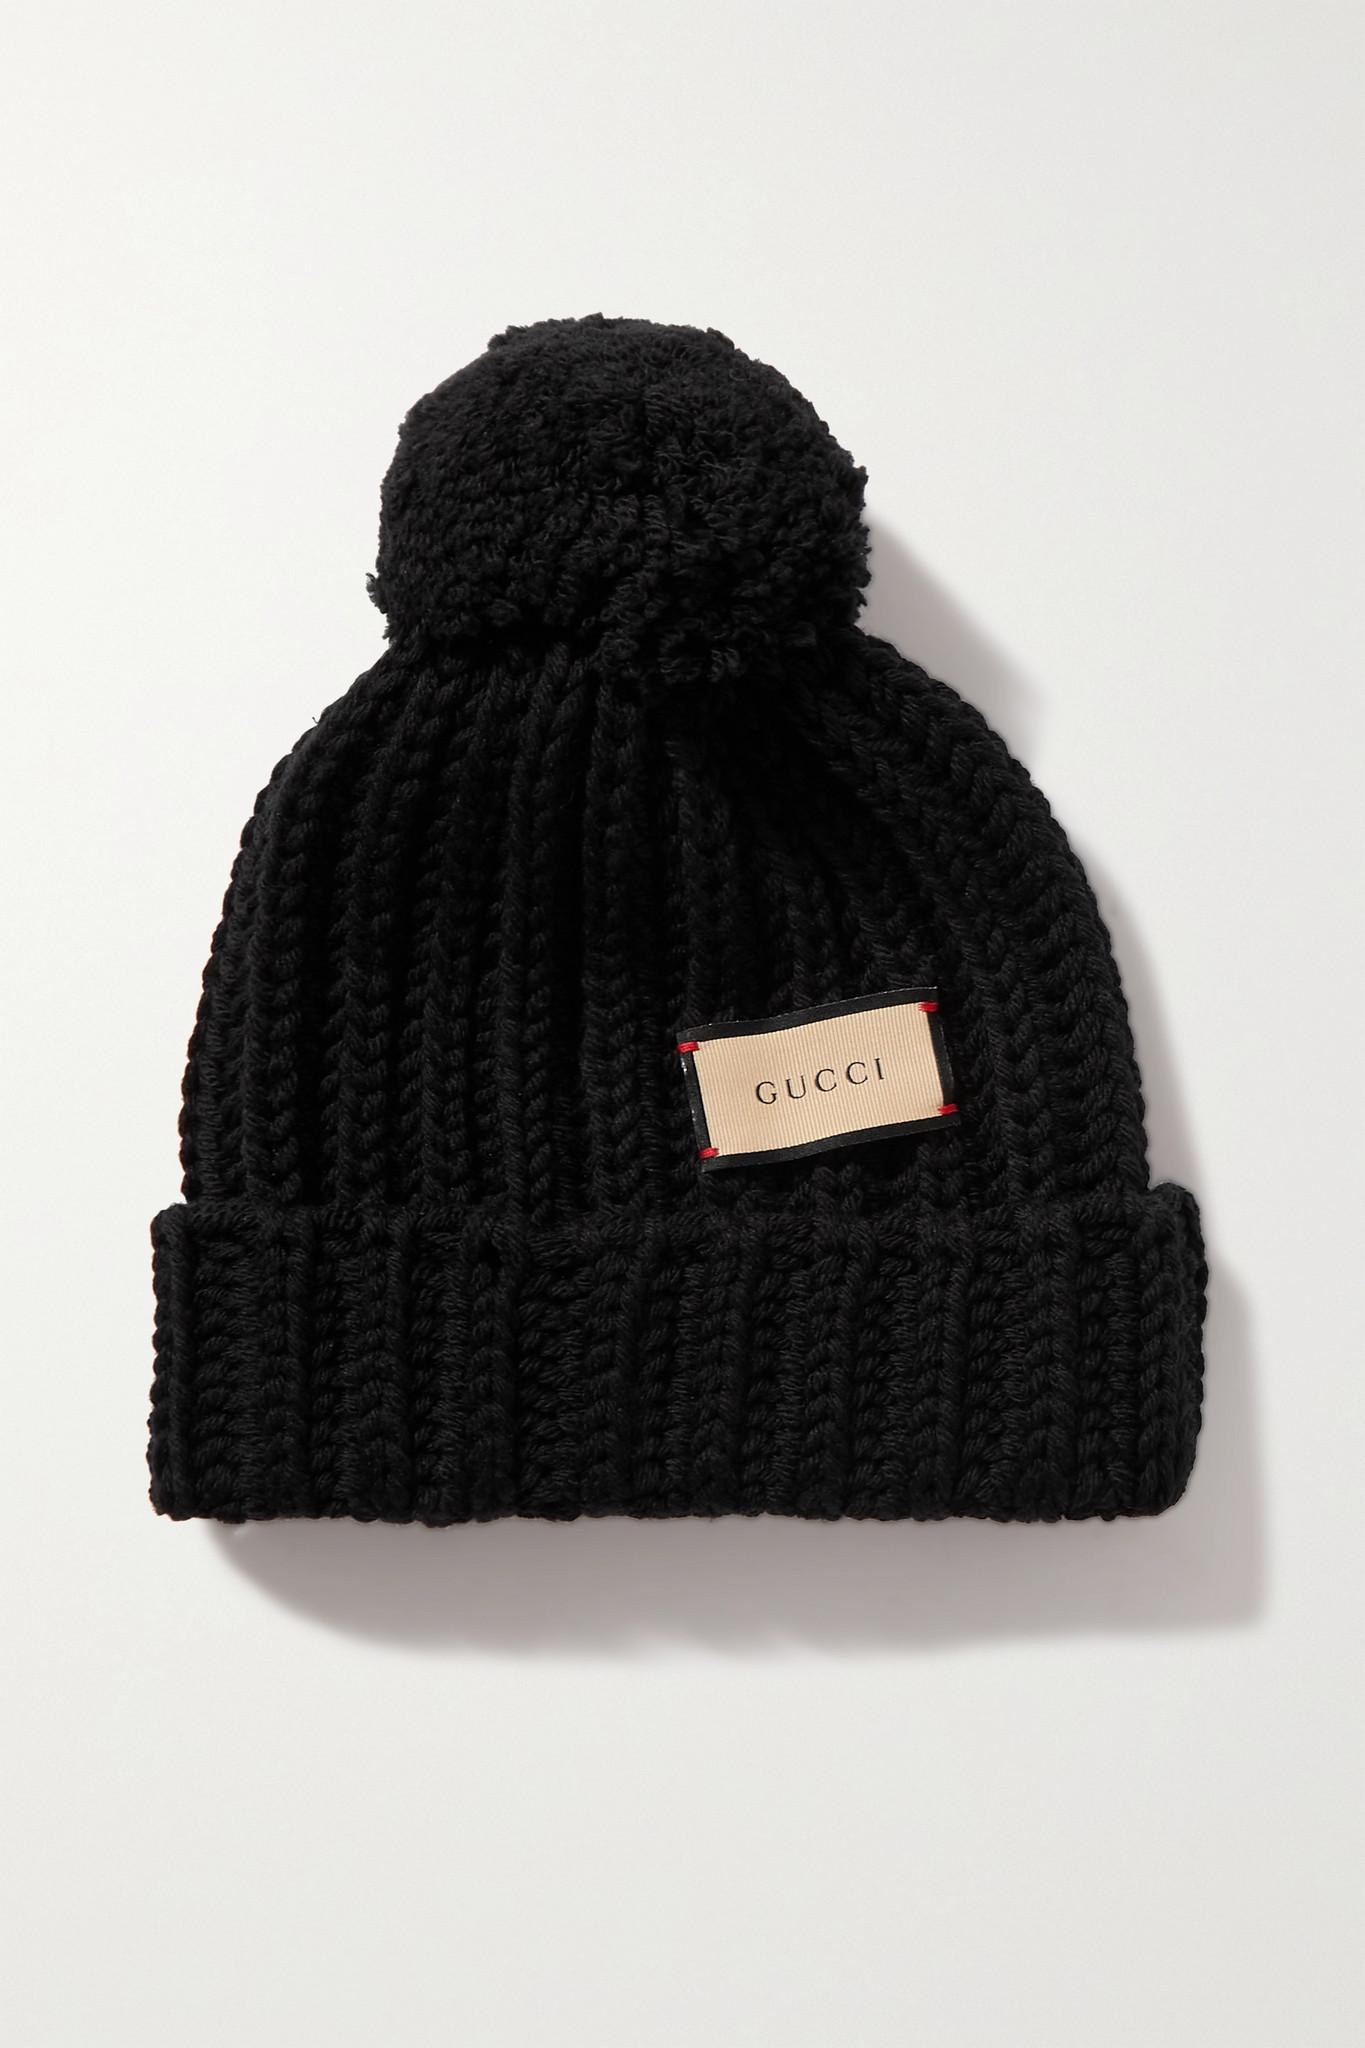 GUCCI - Pompom-embellished Ribbed Wool Beanie - Black - L